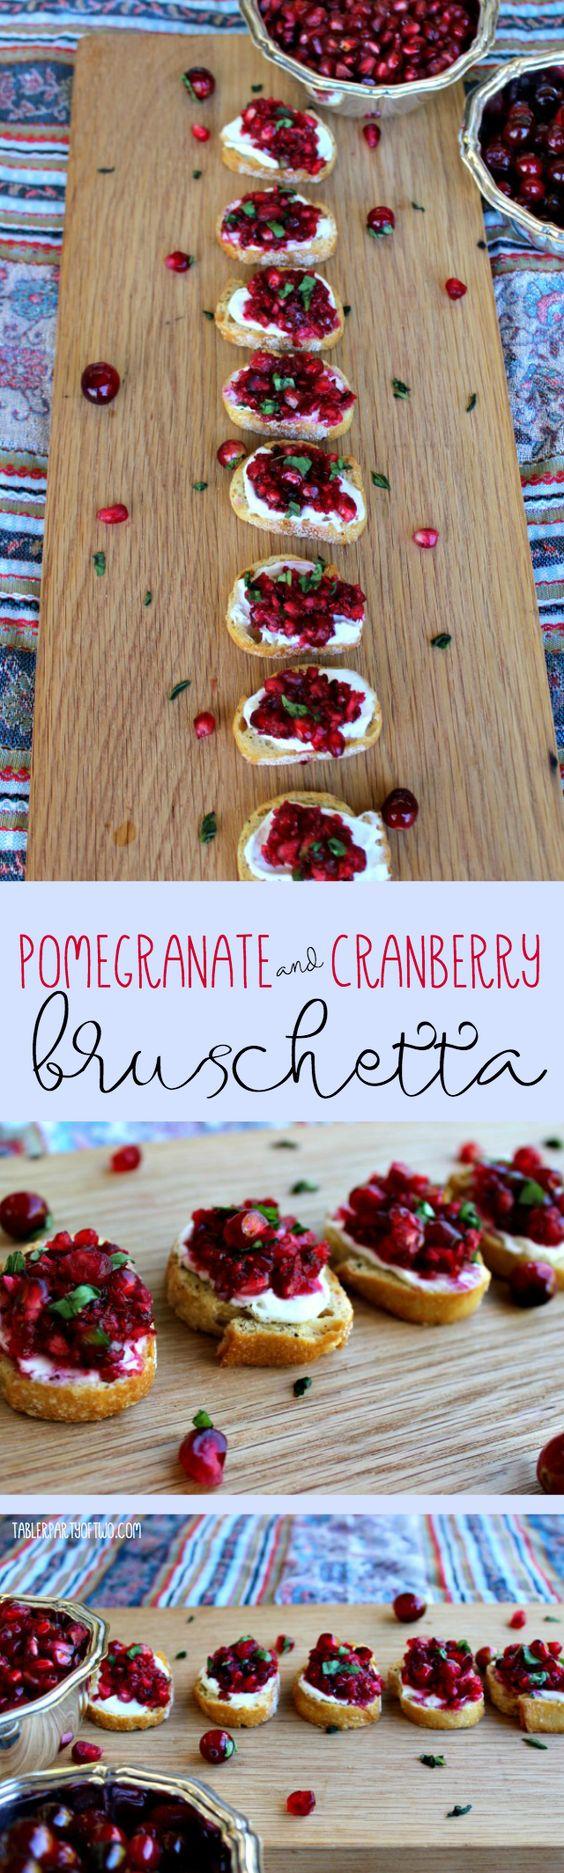 cranberry bruschetta.jpg